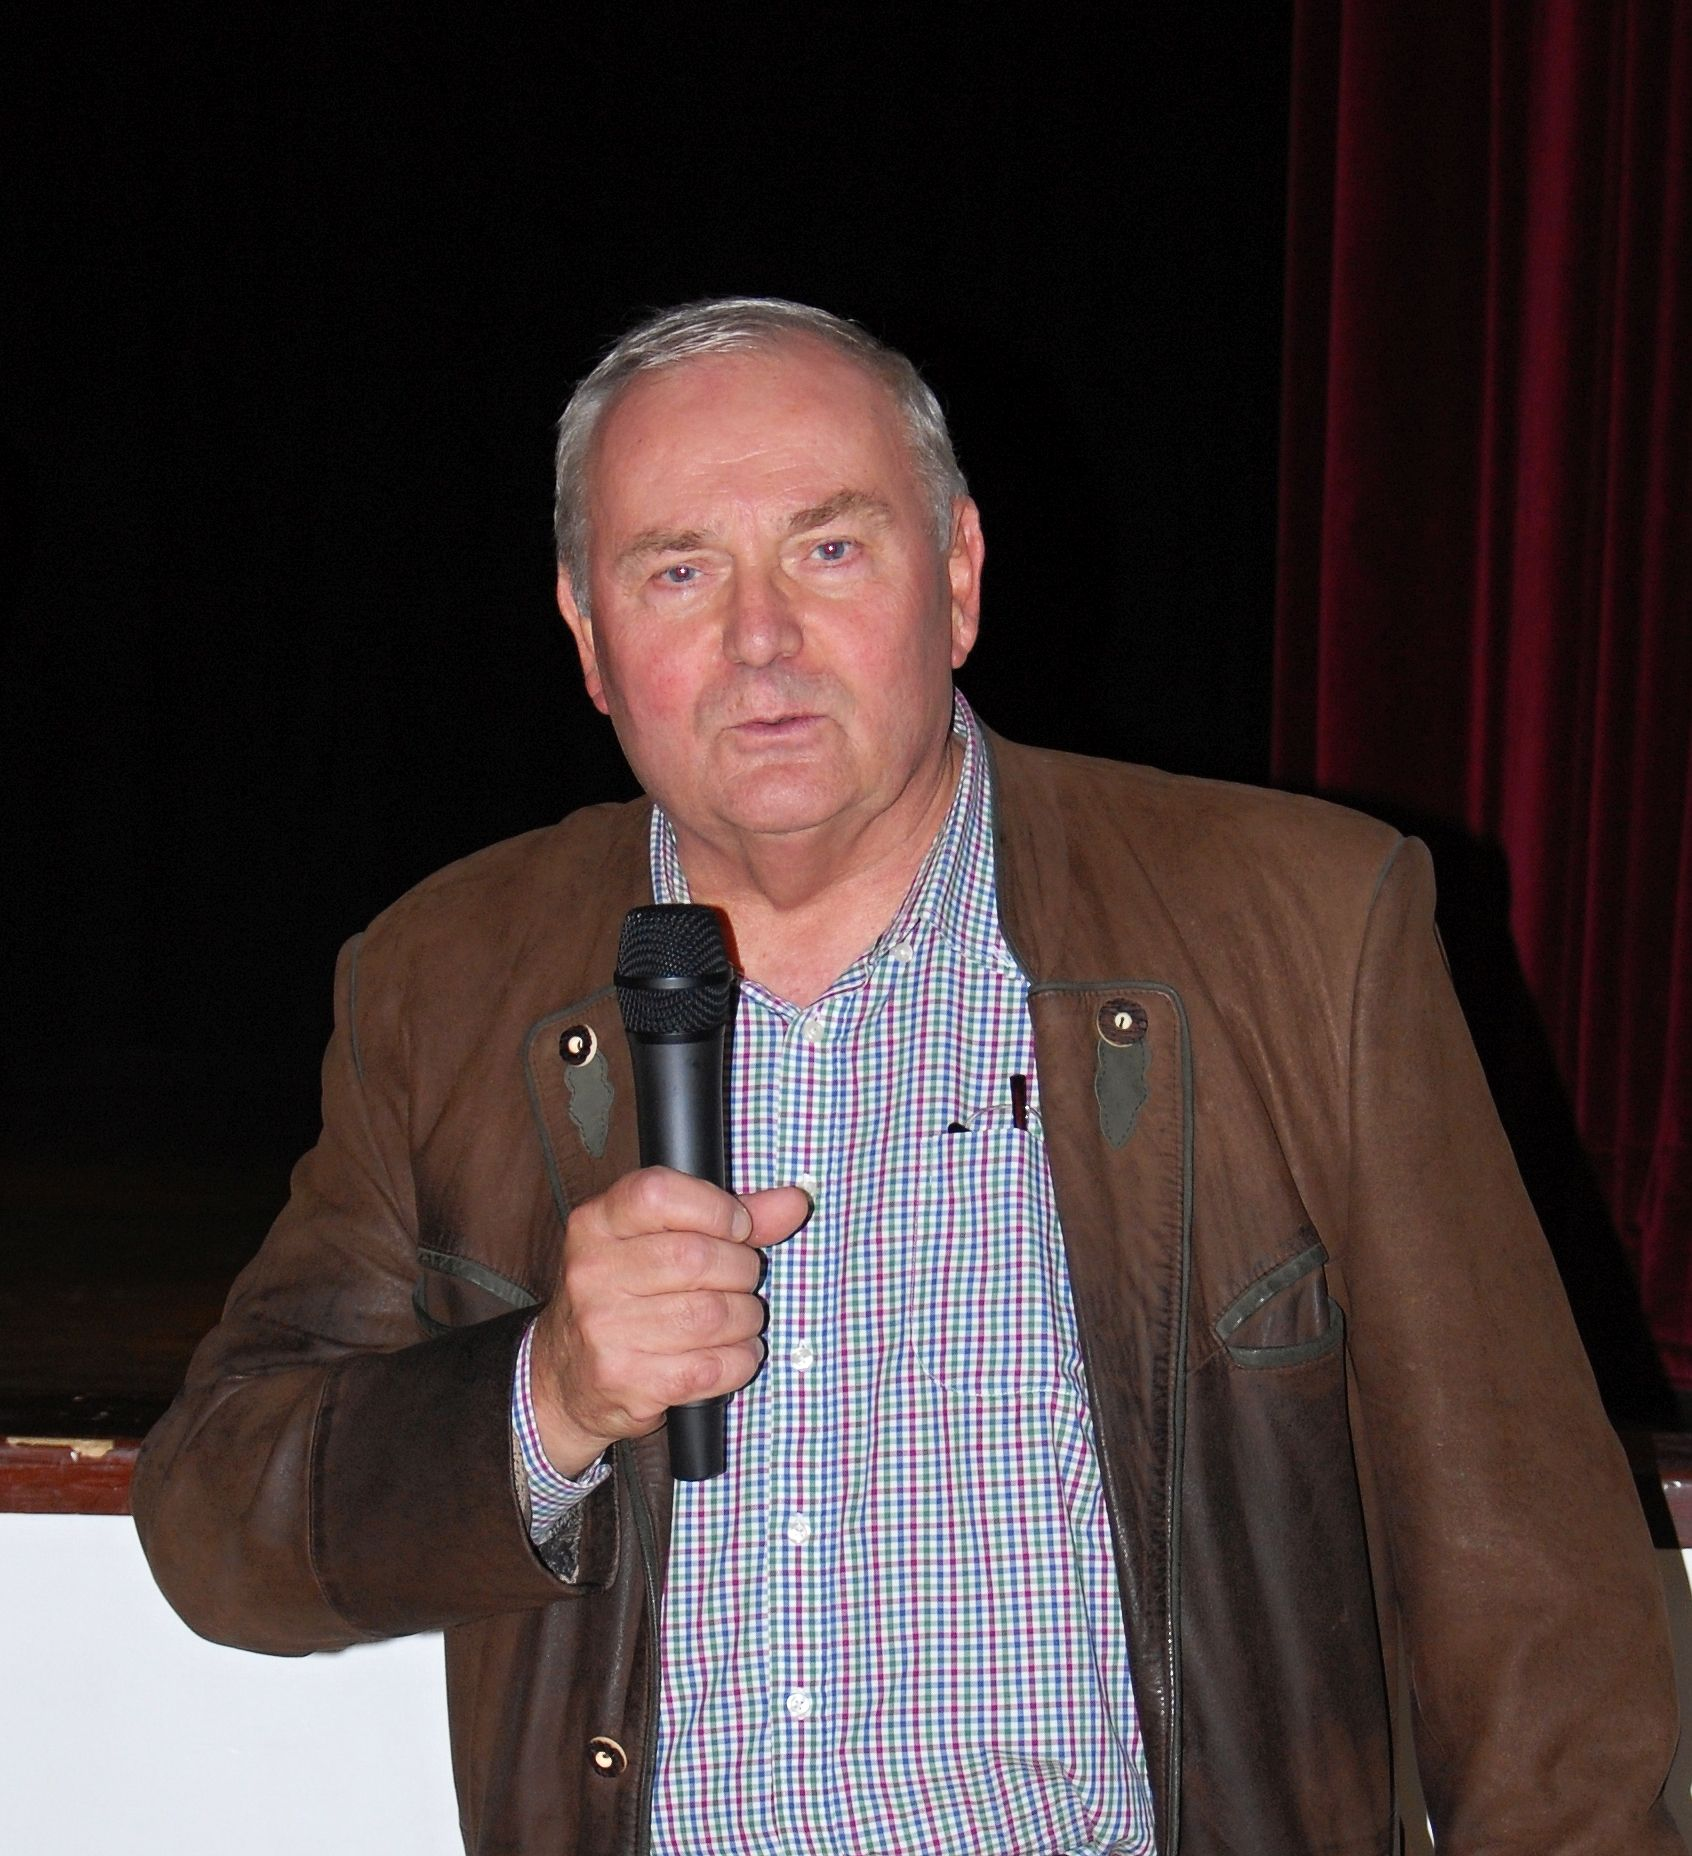 Ondrej Pöss beim Pressburger Treffen 2018